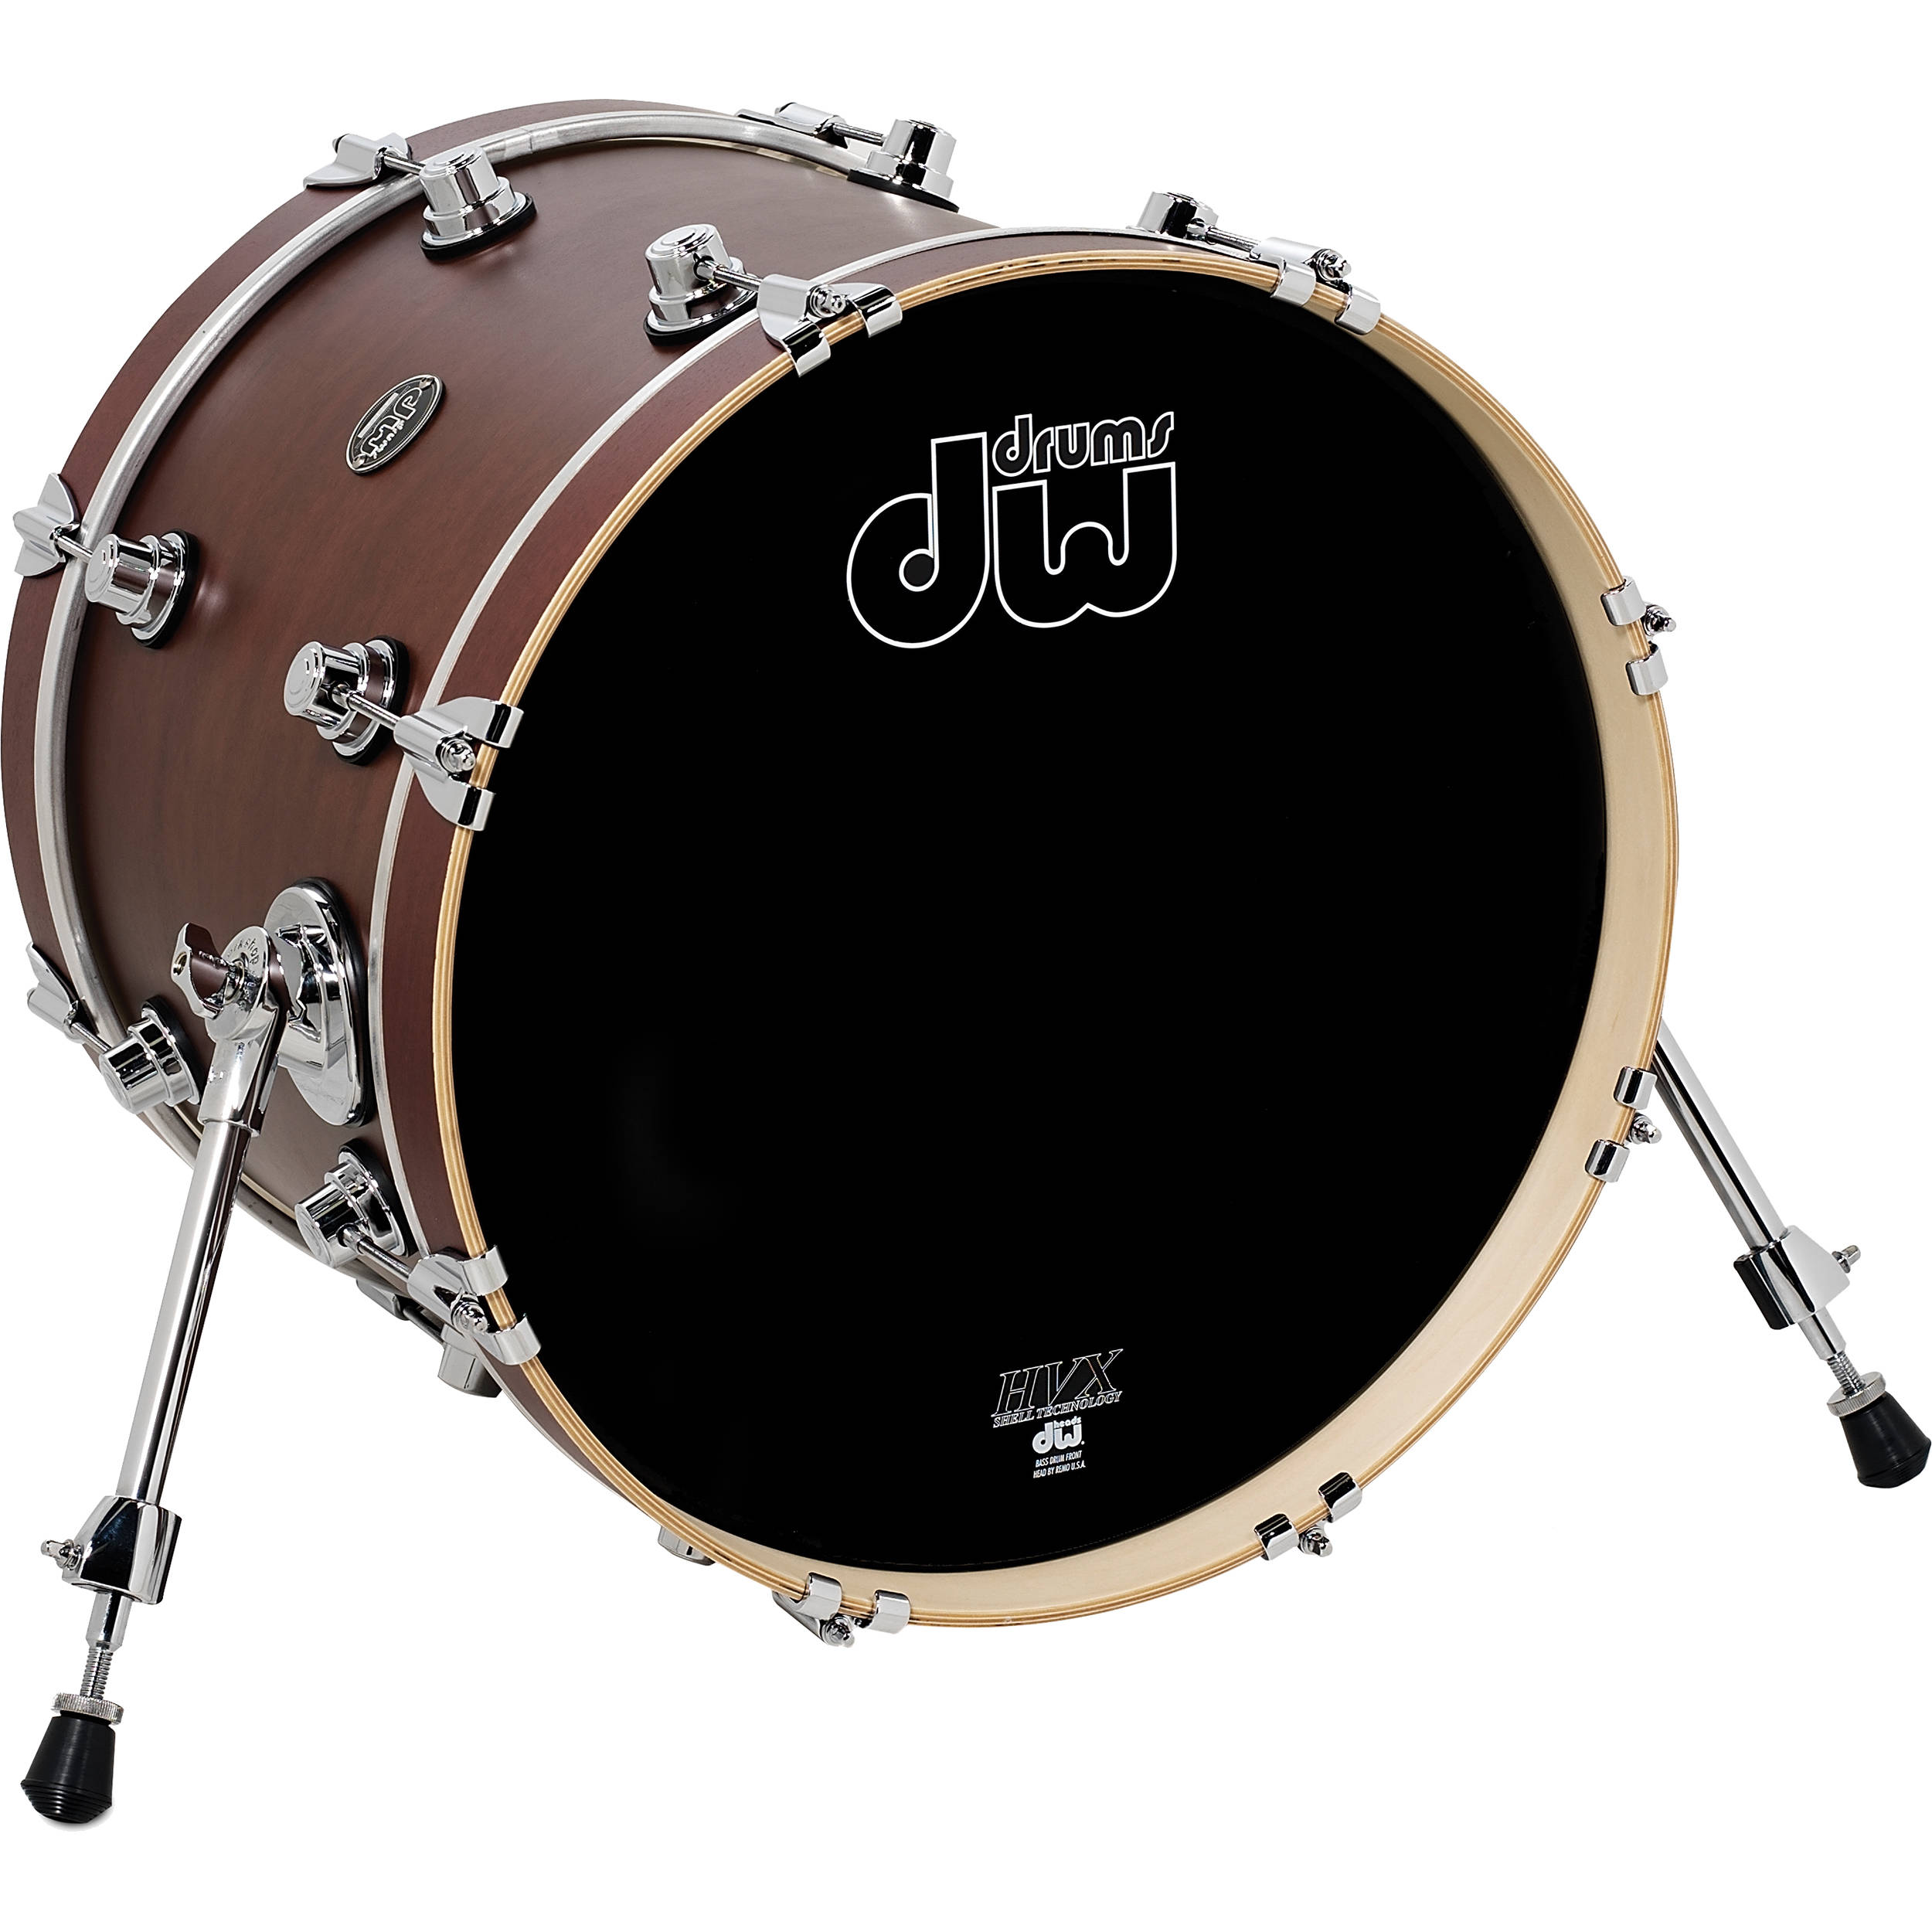 dw drums performance series 14 x 18 kick drps1418kktb. Black Bedroom Furniture Sets. Home Design Ideas